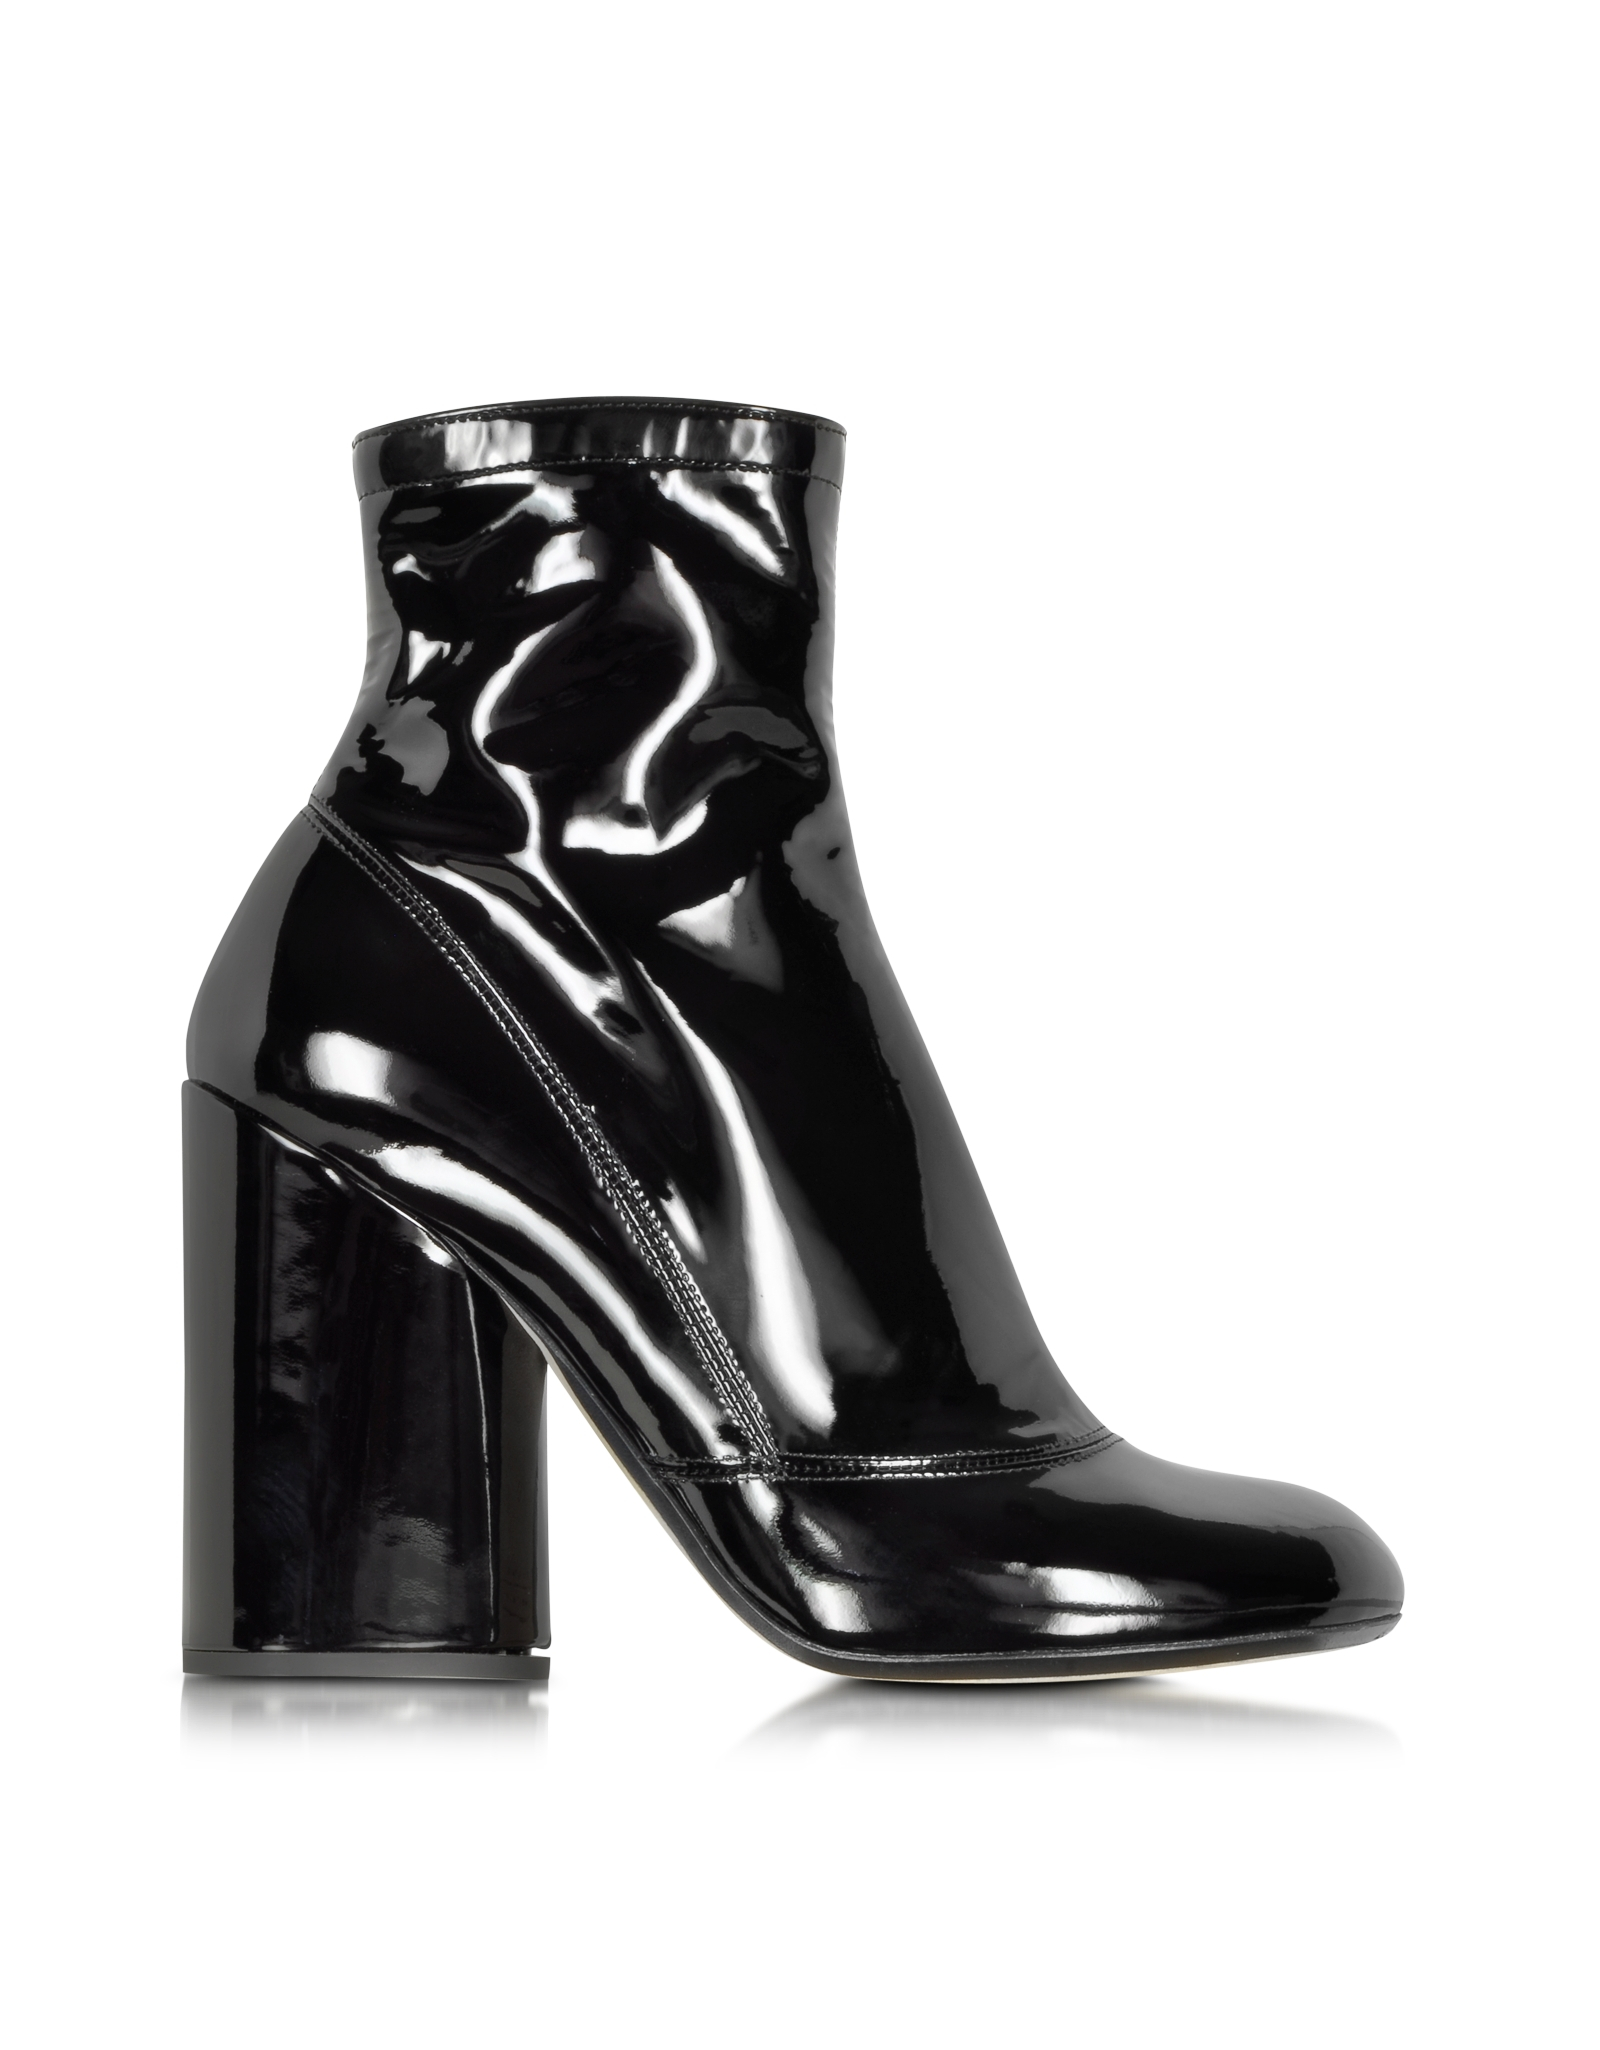 defe88c01e4 Gallery. Women s Sam Edelman Packer Women s Woven Leather Shoes ...